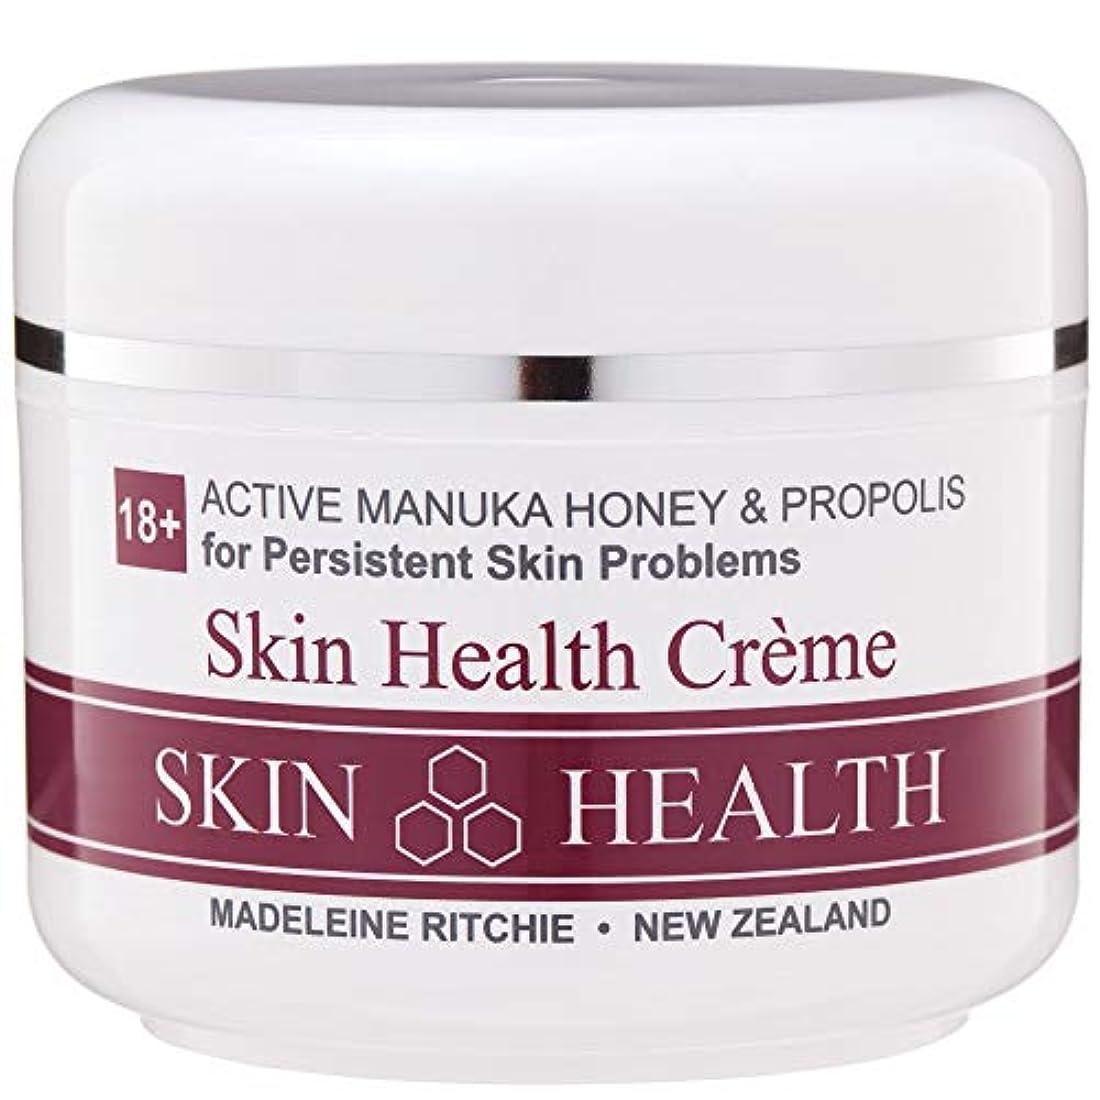 健康的赤字誓約Madeleine Ritchie New Zealand 18+ Active Manuka Honey Skin Health Cream Jar 100ml